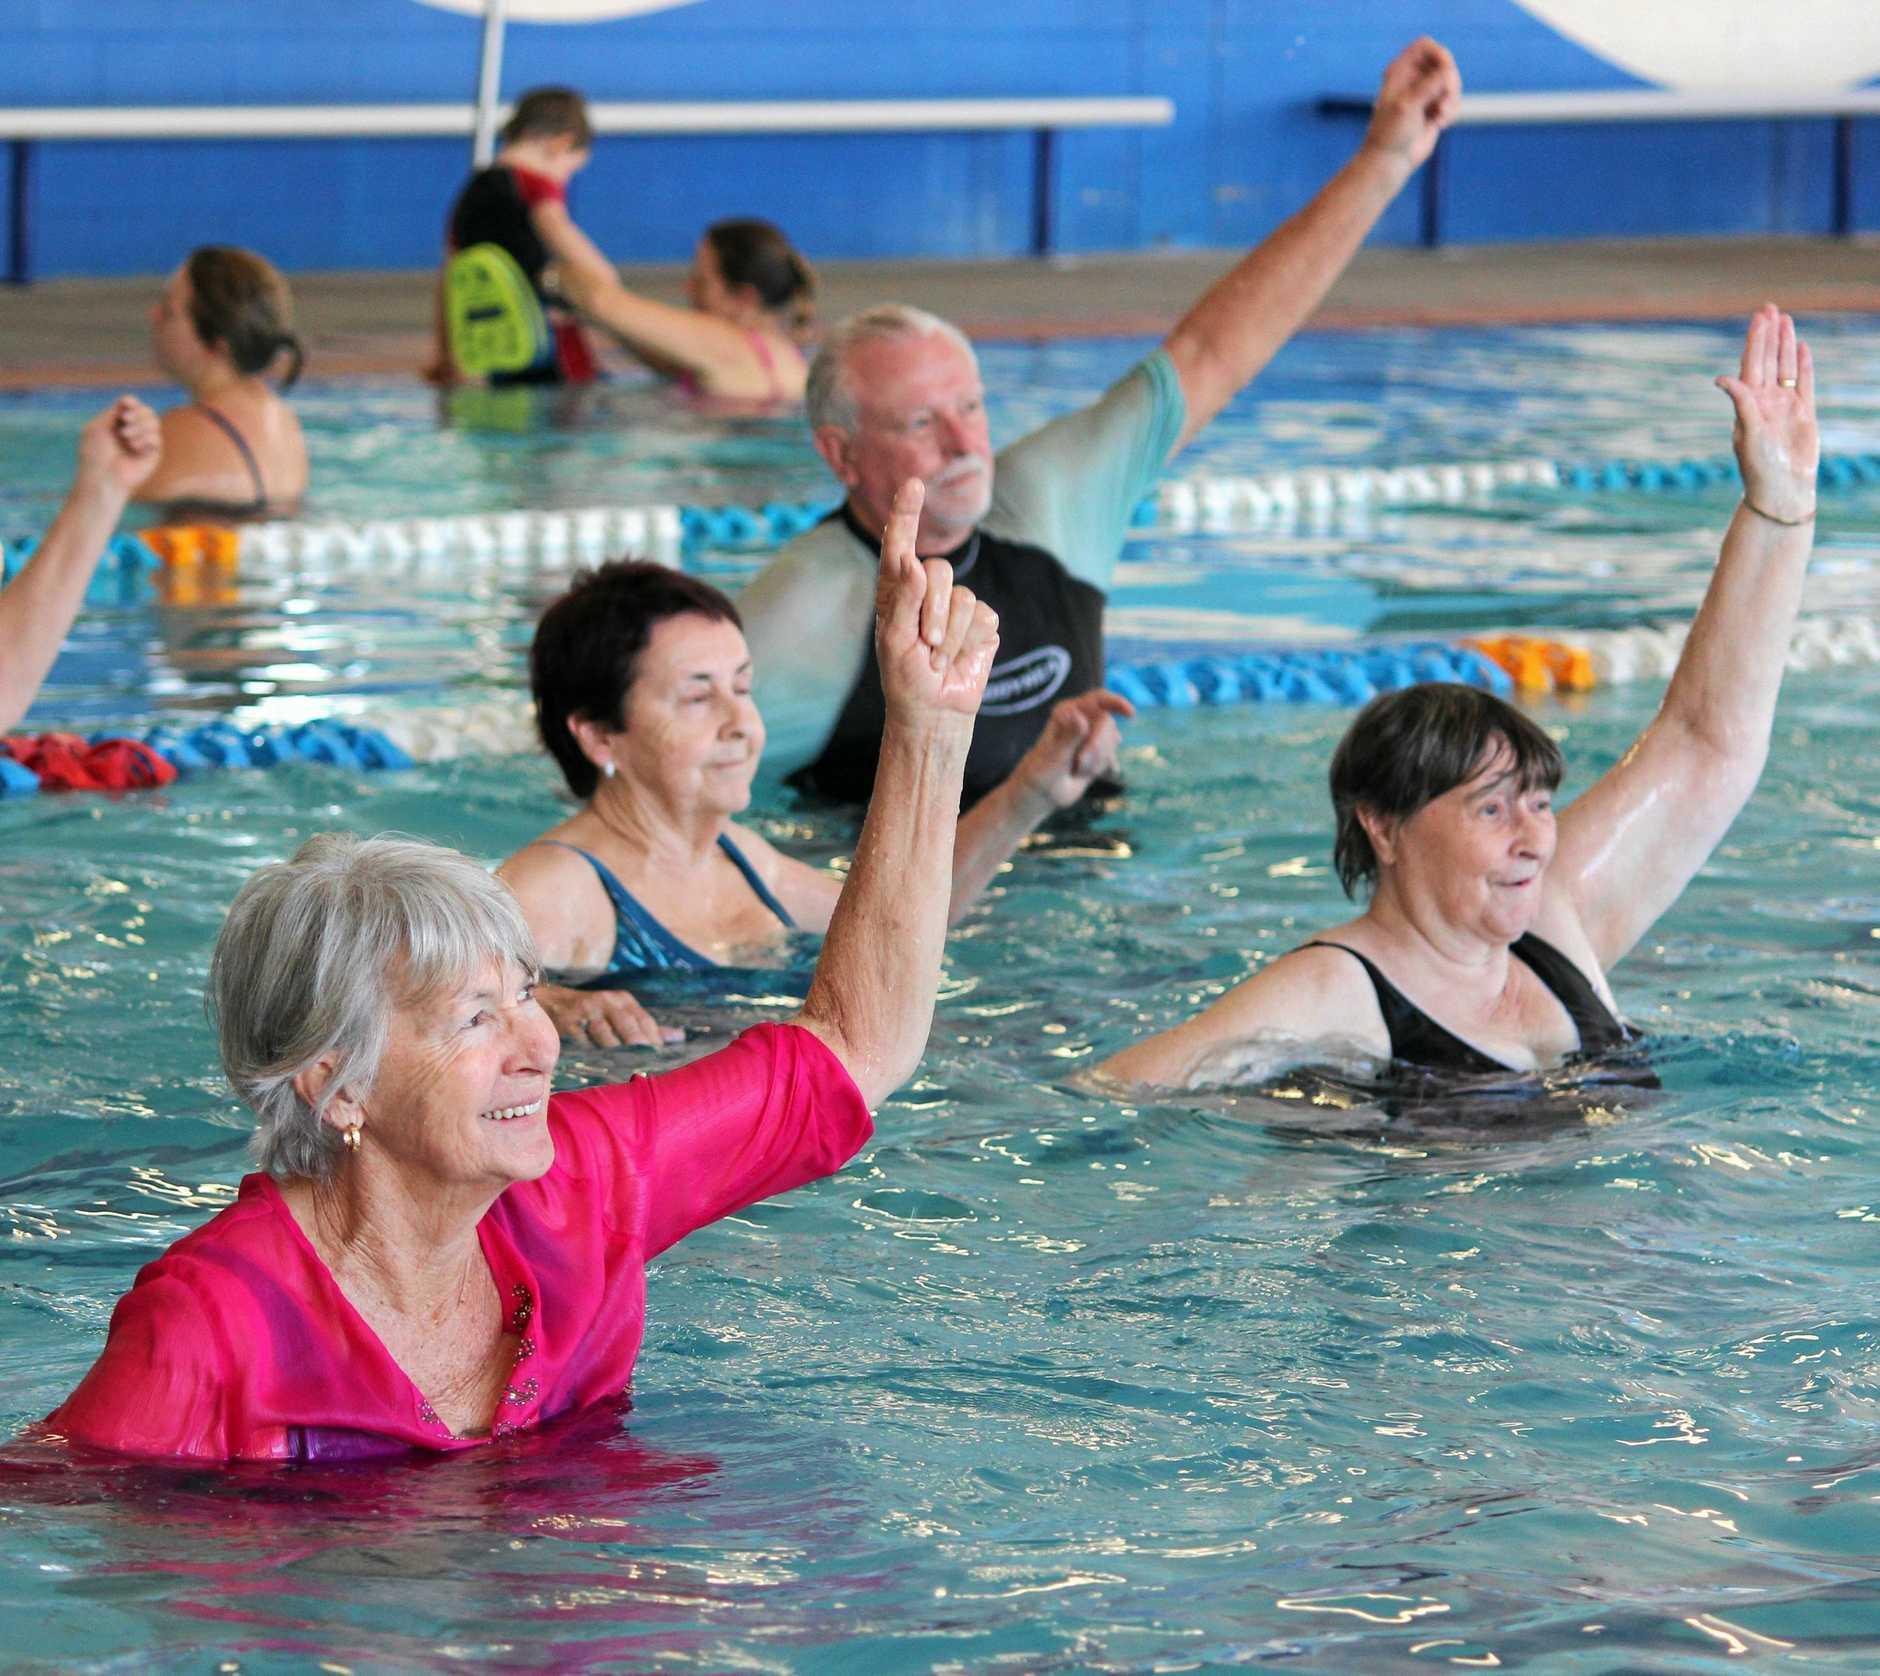 Seniors enjoy the benefits of Aqua fitness classes.